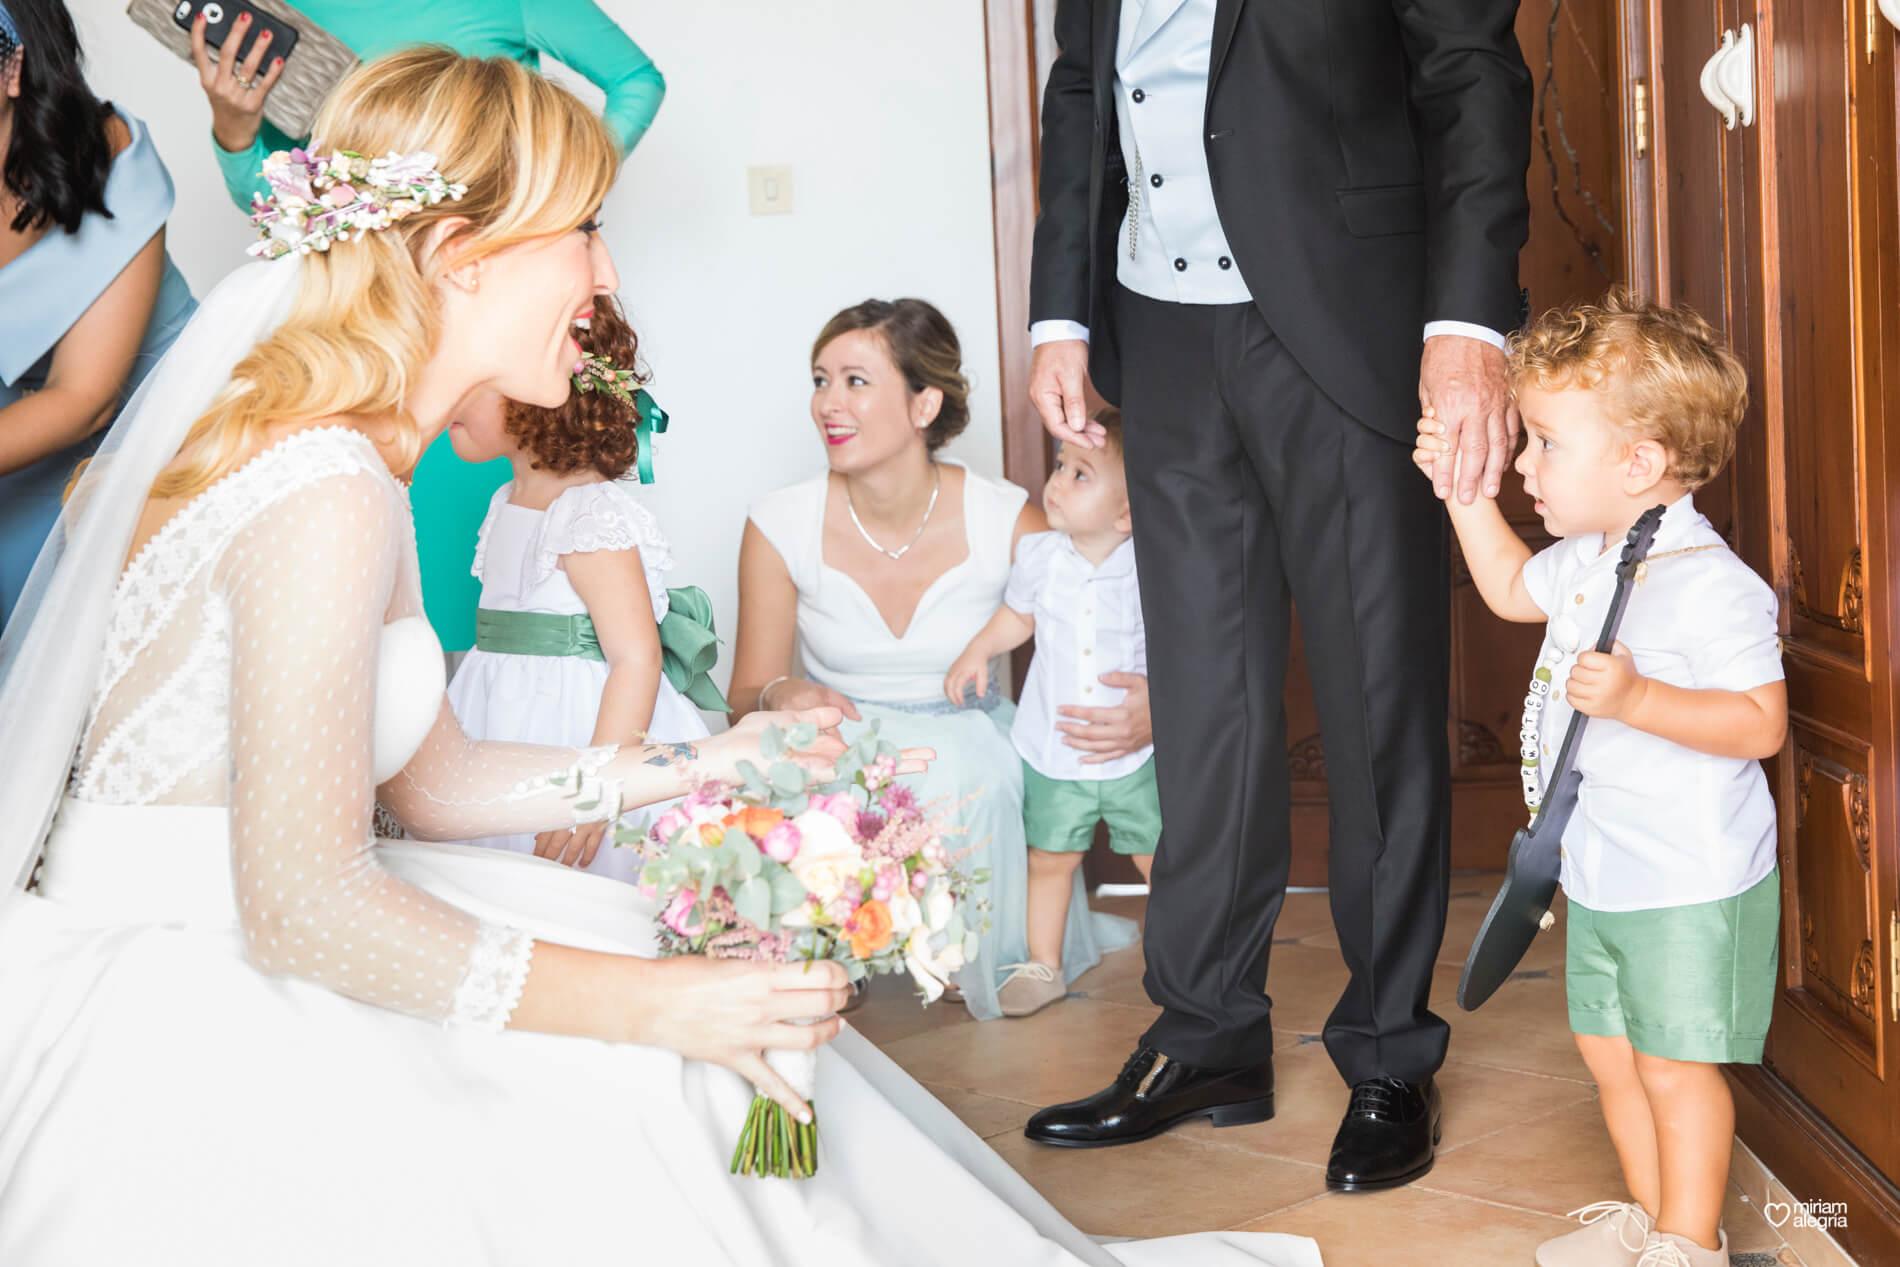 la-boda-de-alemc7-miriam-alegria-fotografos-boda-murcia-34